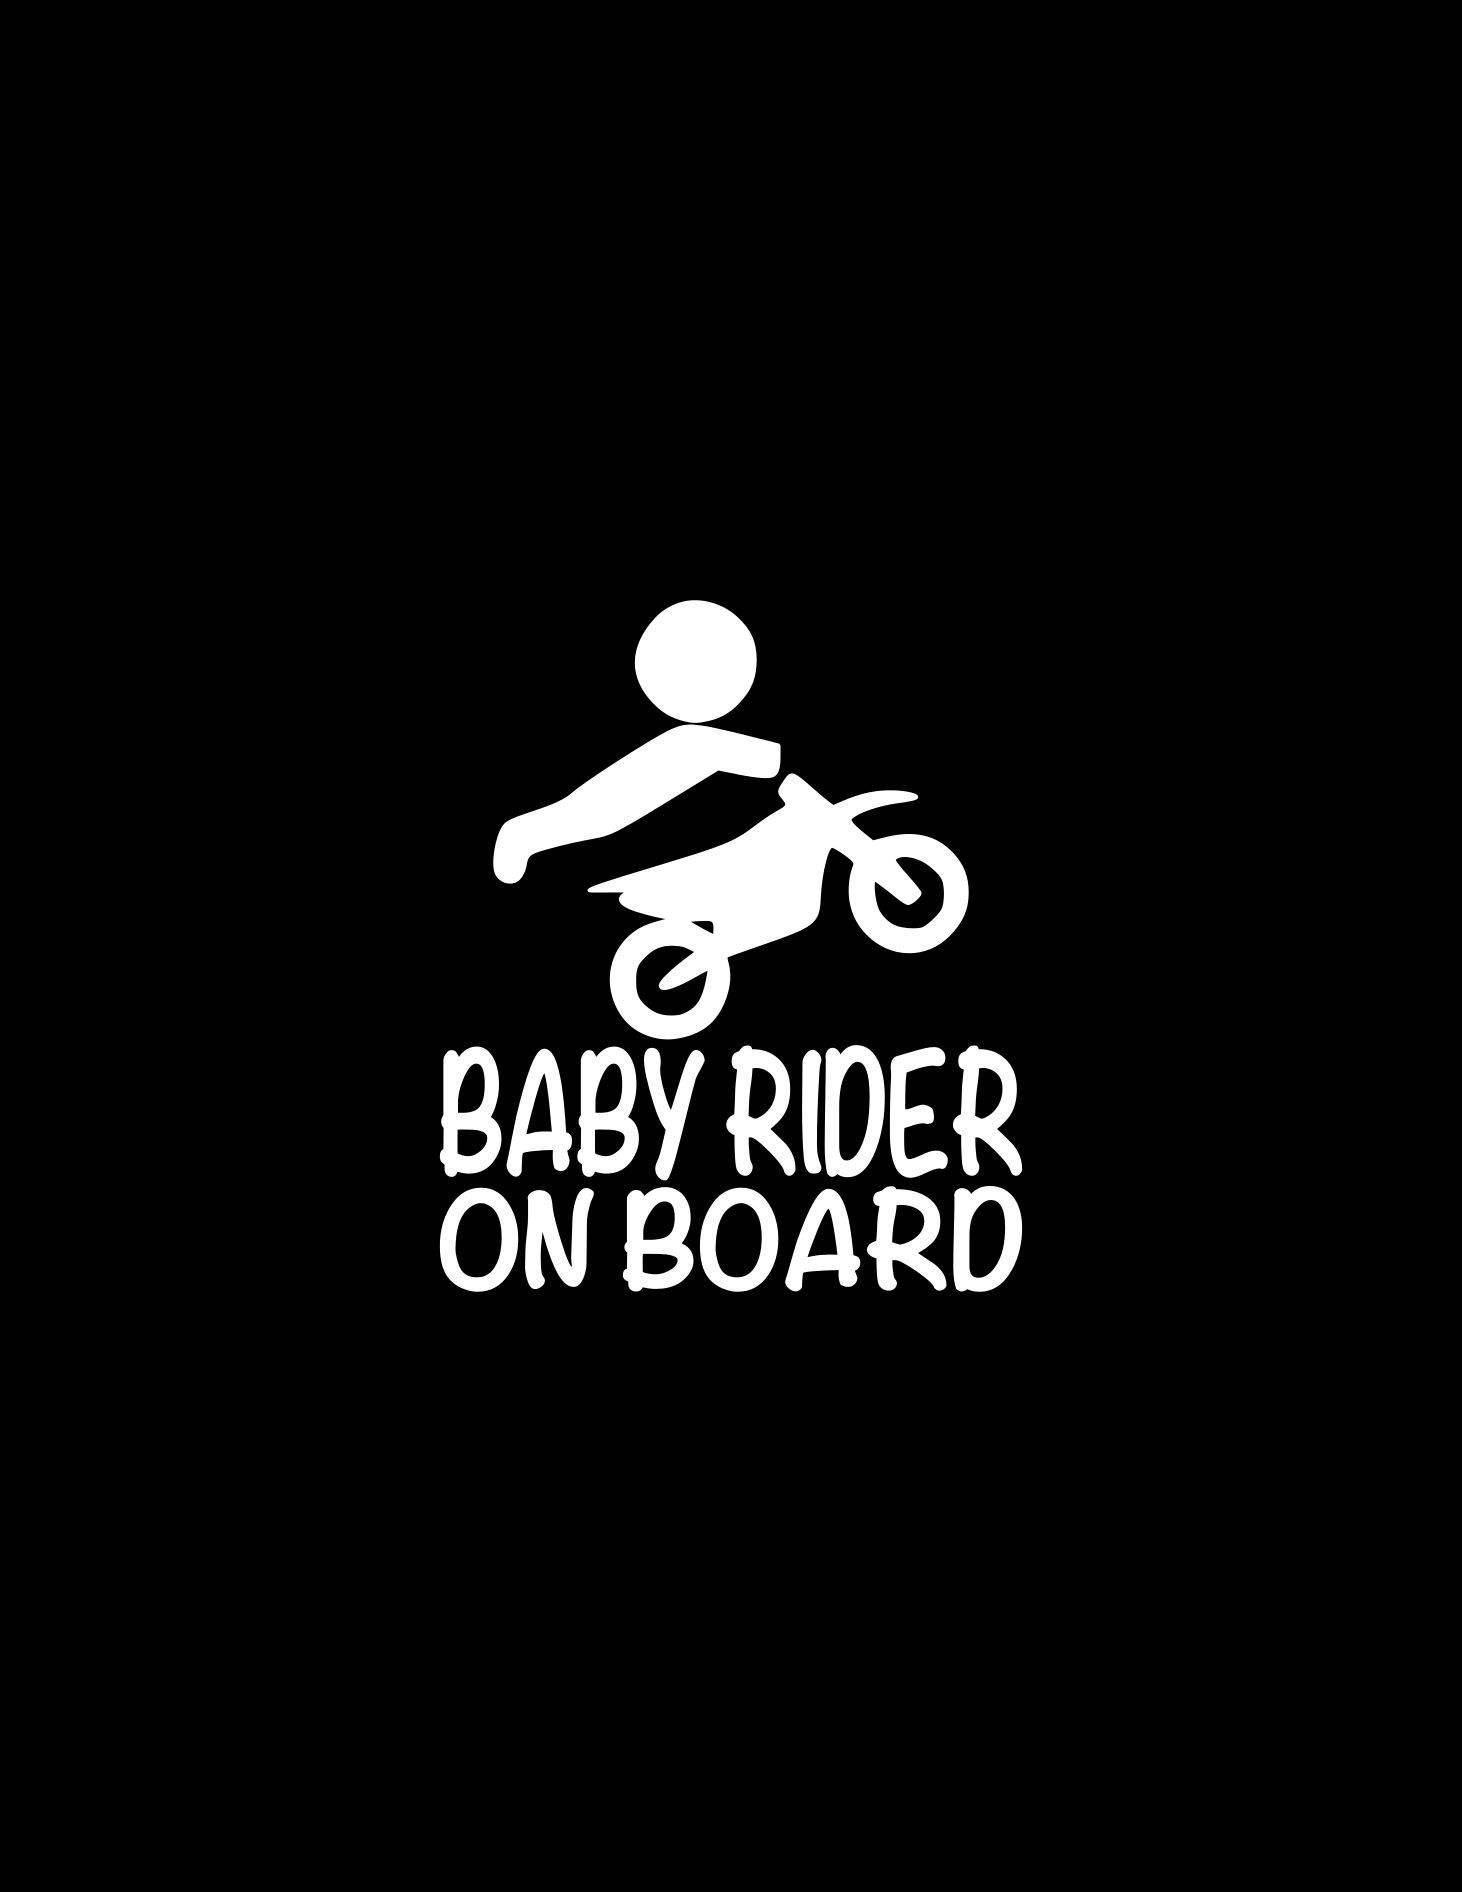 Baby Rider On Board Decal Dirt Bike Decal Dirt Biking Kid On Board Car Decal Baby On Board Car Decal Window Decal Wall Graffiti Logo Digital Word Art Lettering [ 1892 x 1462 Pixel ]